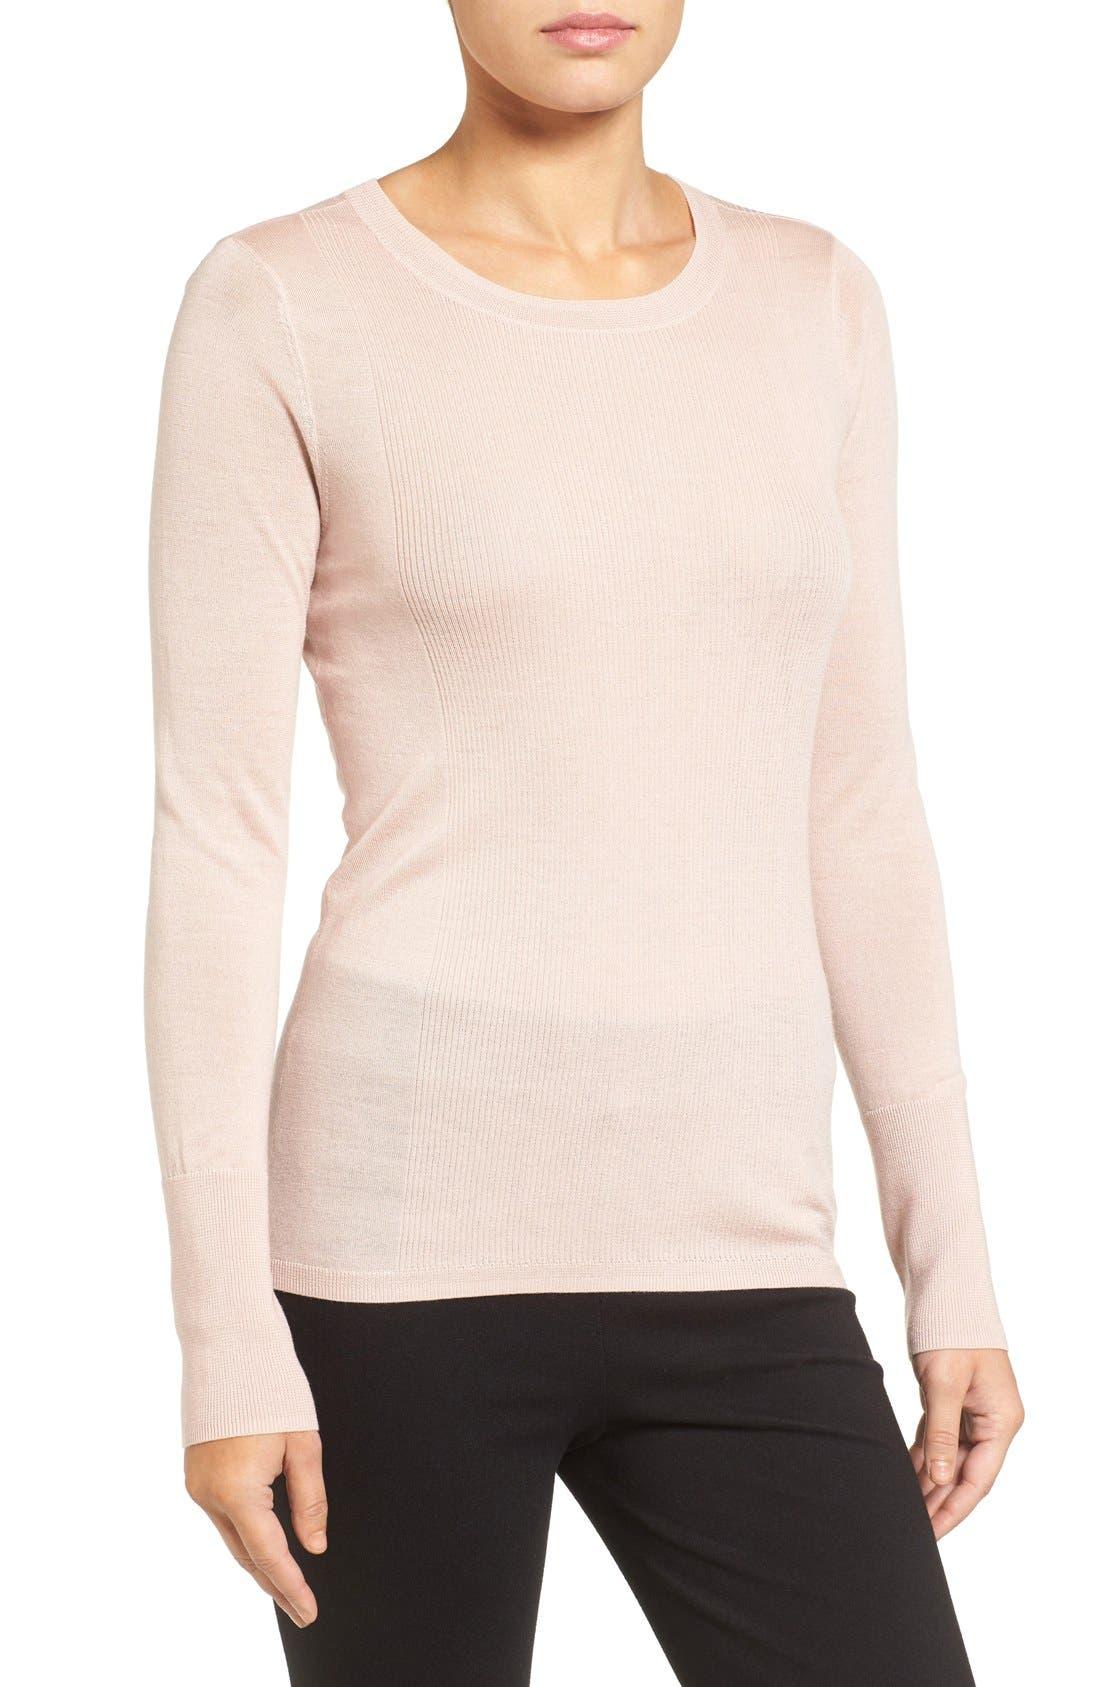 Main Image - Halogen® Rib Detail Lightweight Merino Wool Sweater (Regular & Petite)